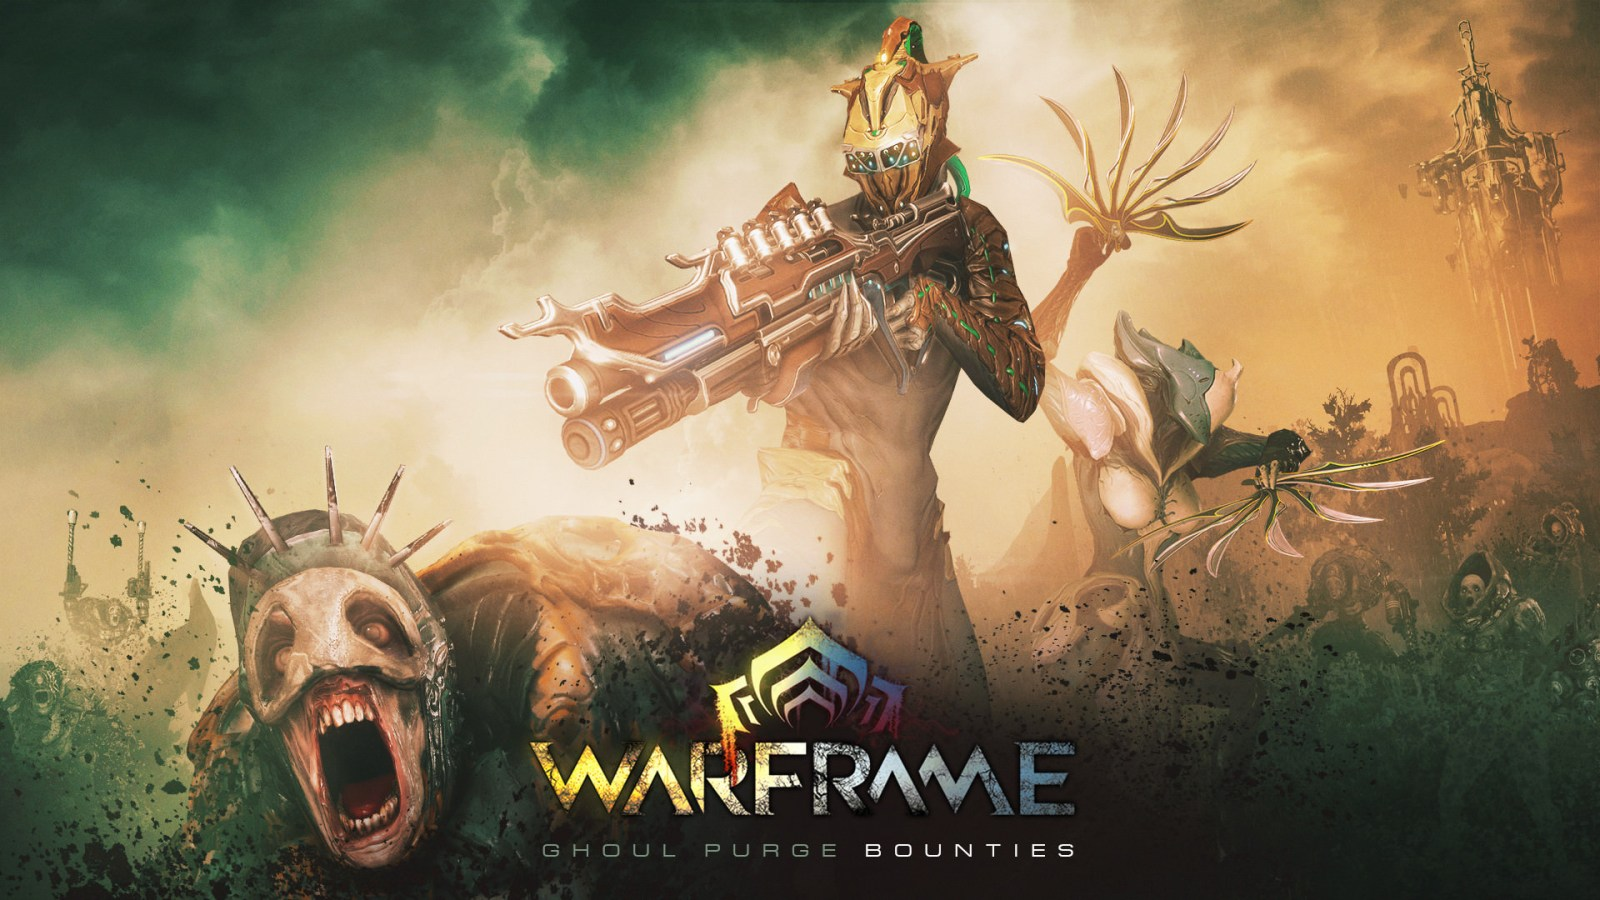 Warframe Patch 1 52 22 10 1 Verfugbar Play Experience Warframe nova build 2020 guide. warframe patch 1 52 22 10 1